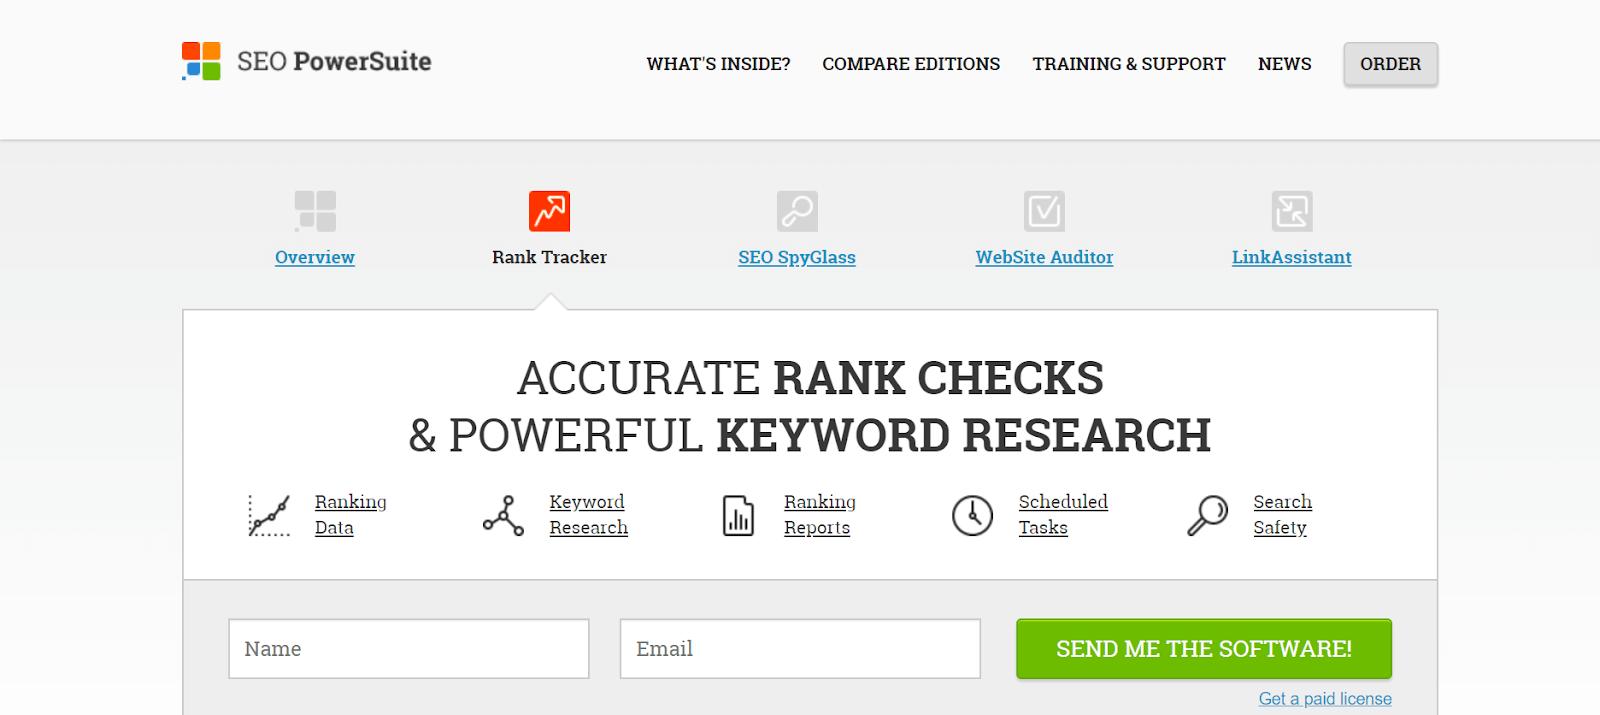 SEO PowerSuite Rank Tracker Tools